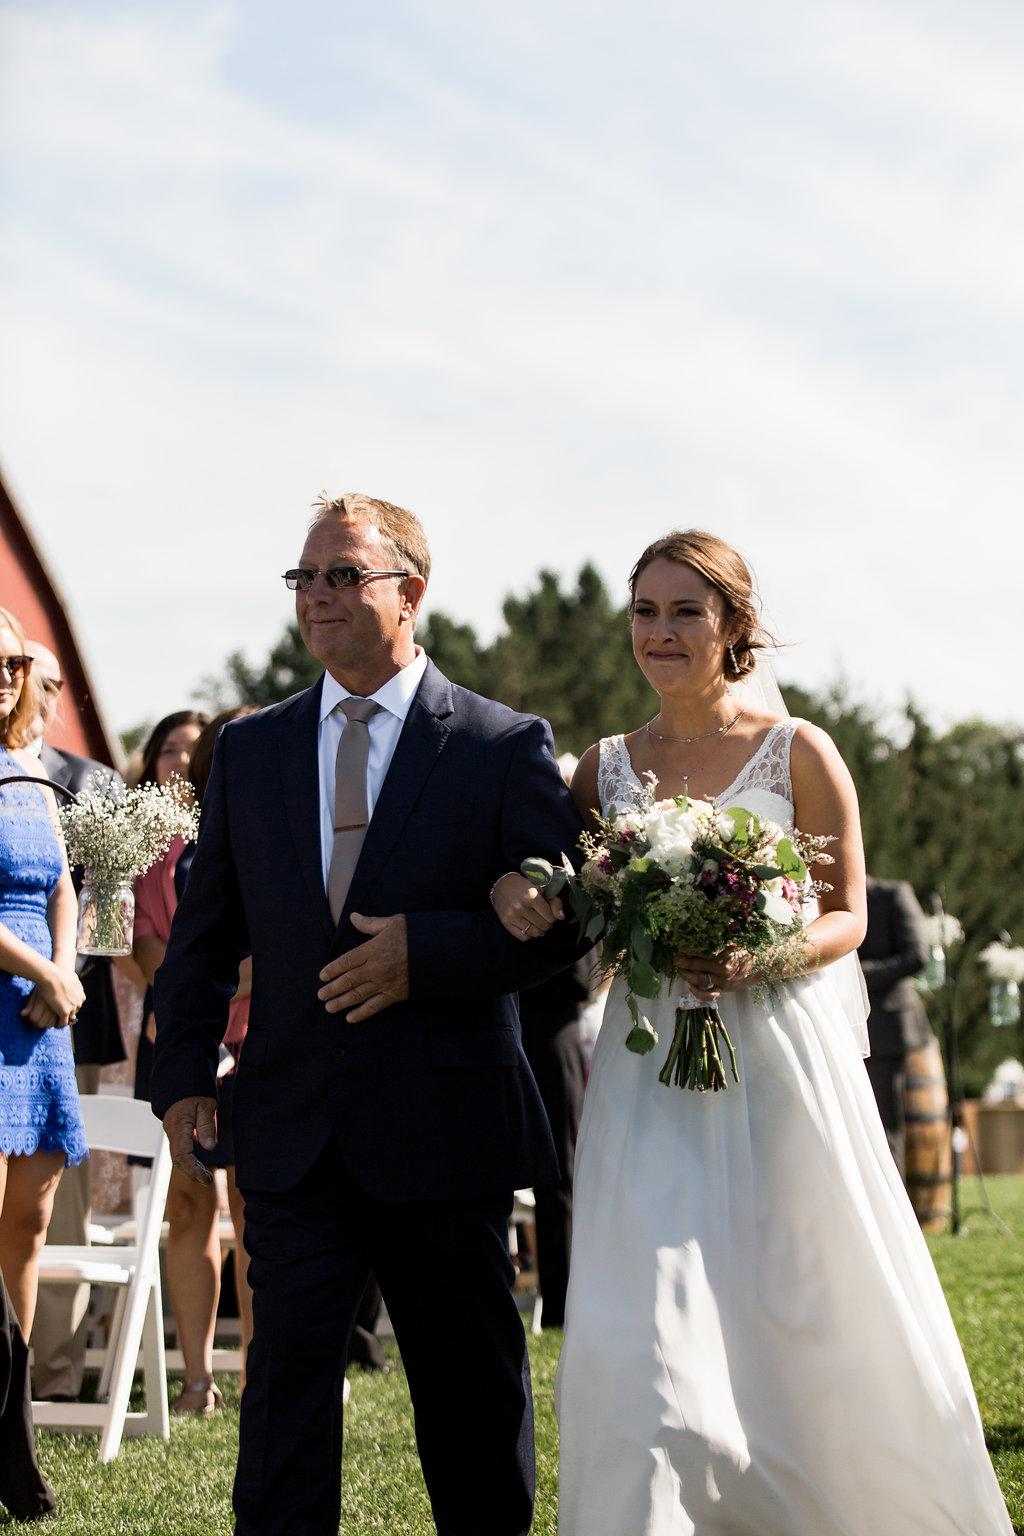 Sonshine_barn_northern_michigan_wedding_-67.jpg